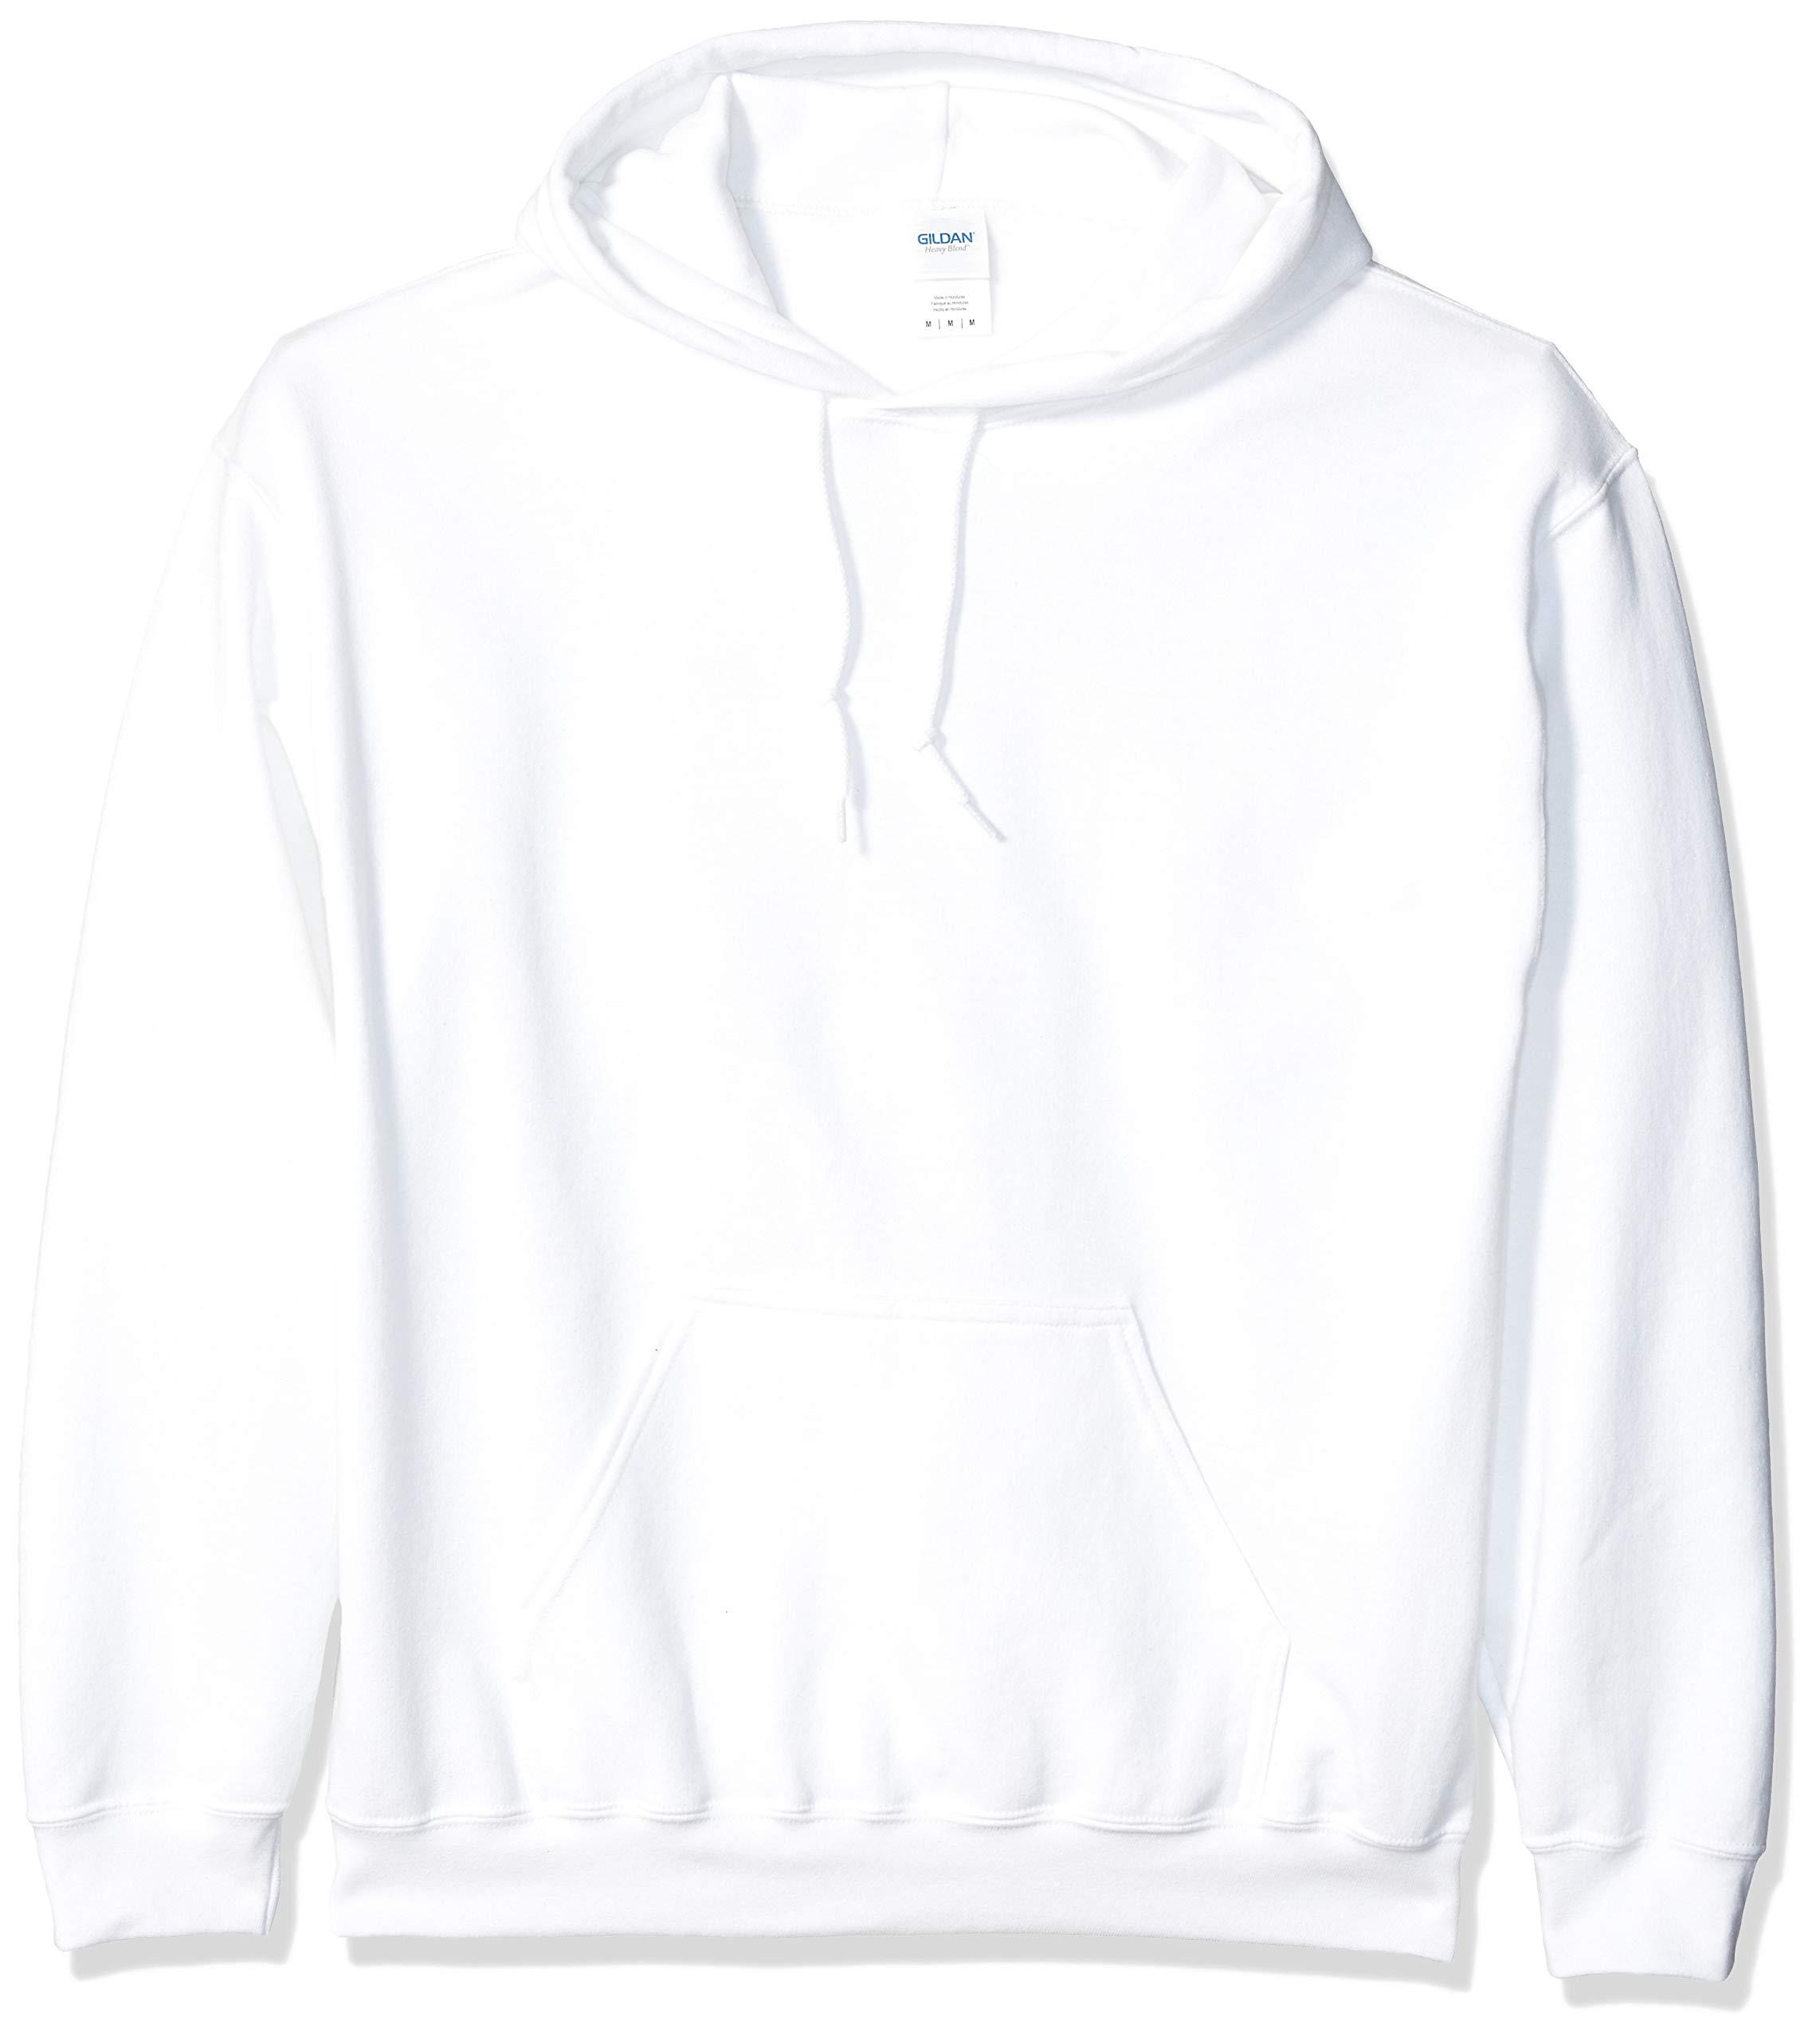 Gildan Men's Heavy Blend Fleece Hooded Sweatshirt G18500, White, Small